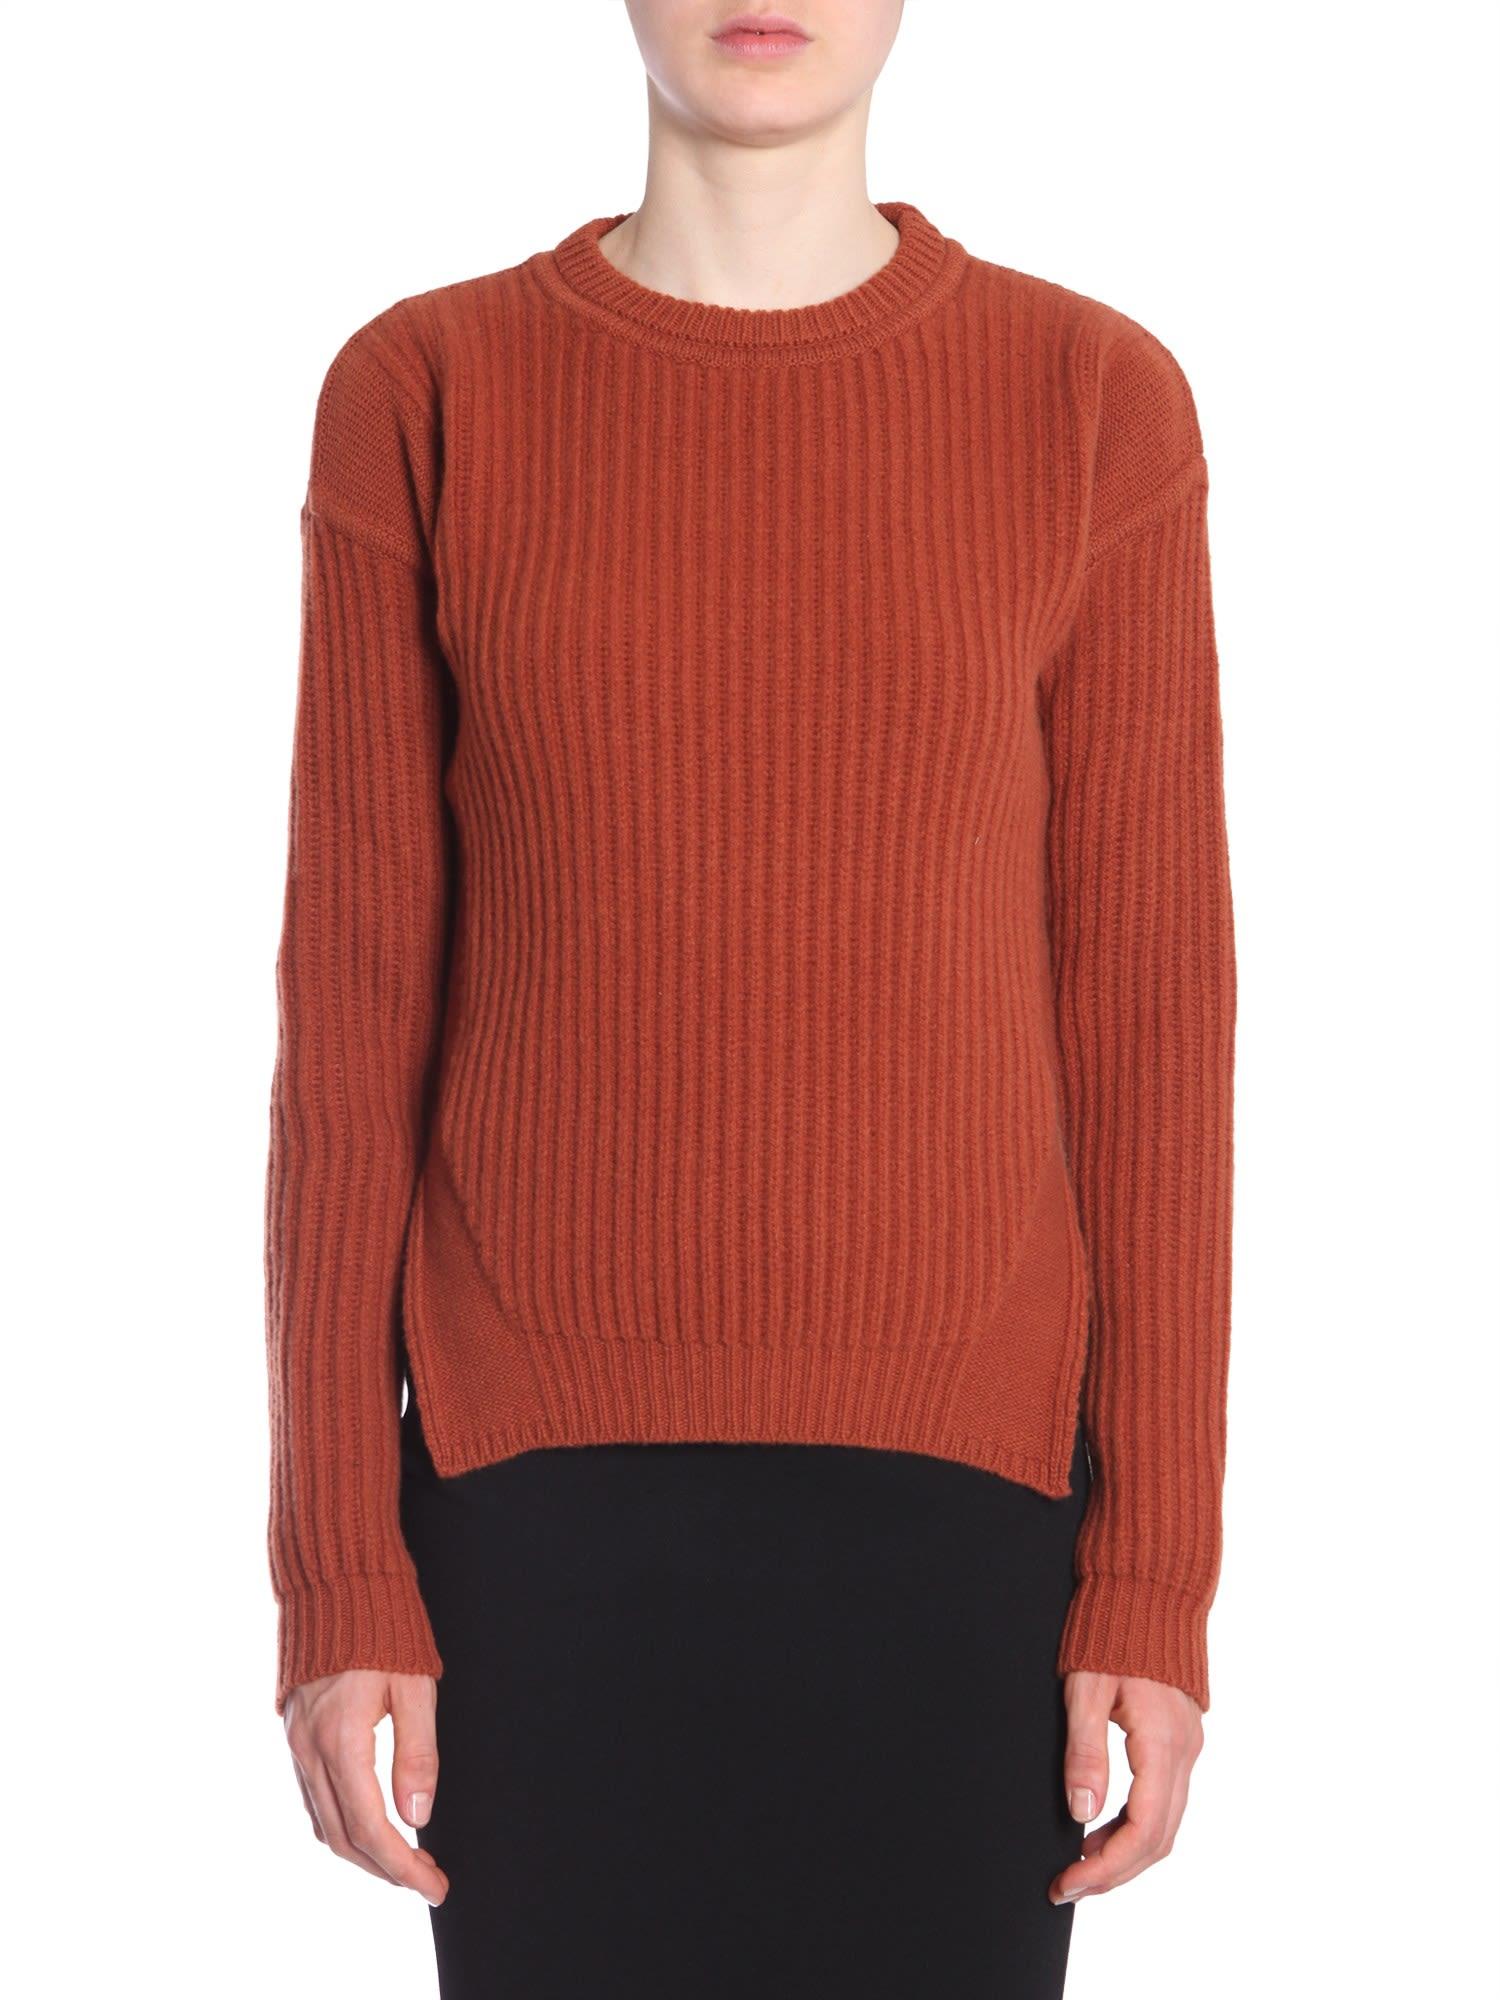 Rick Owens Round Collar Sweater